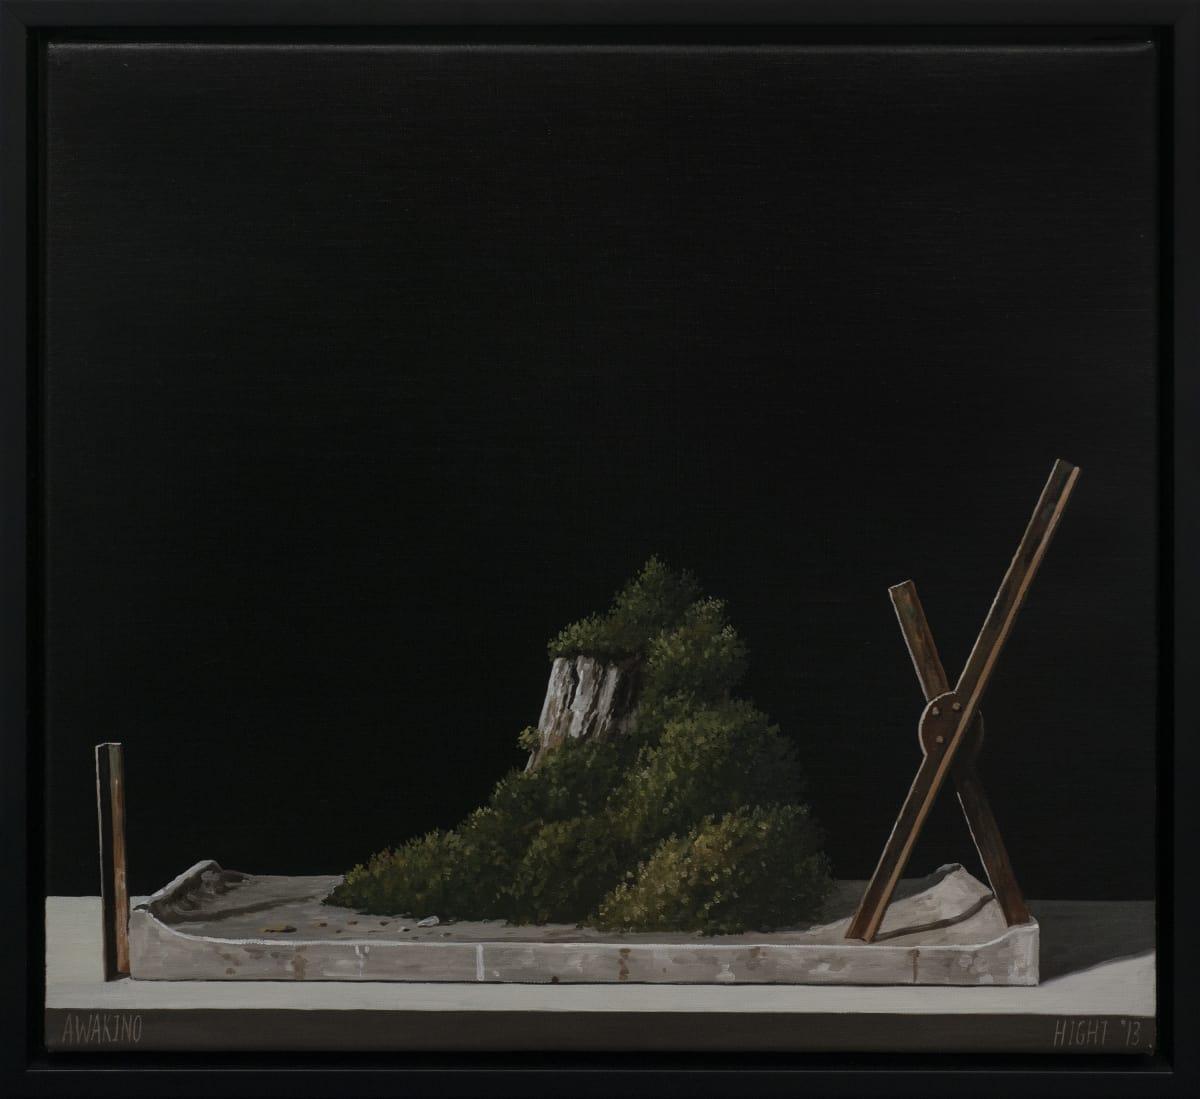 Michael Hight  Awakino, 2012  Oil on linen  14 x 16.1 in 35.5 x 41 cm